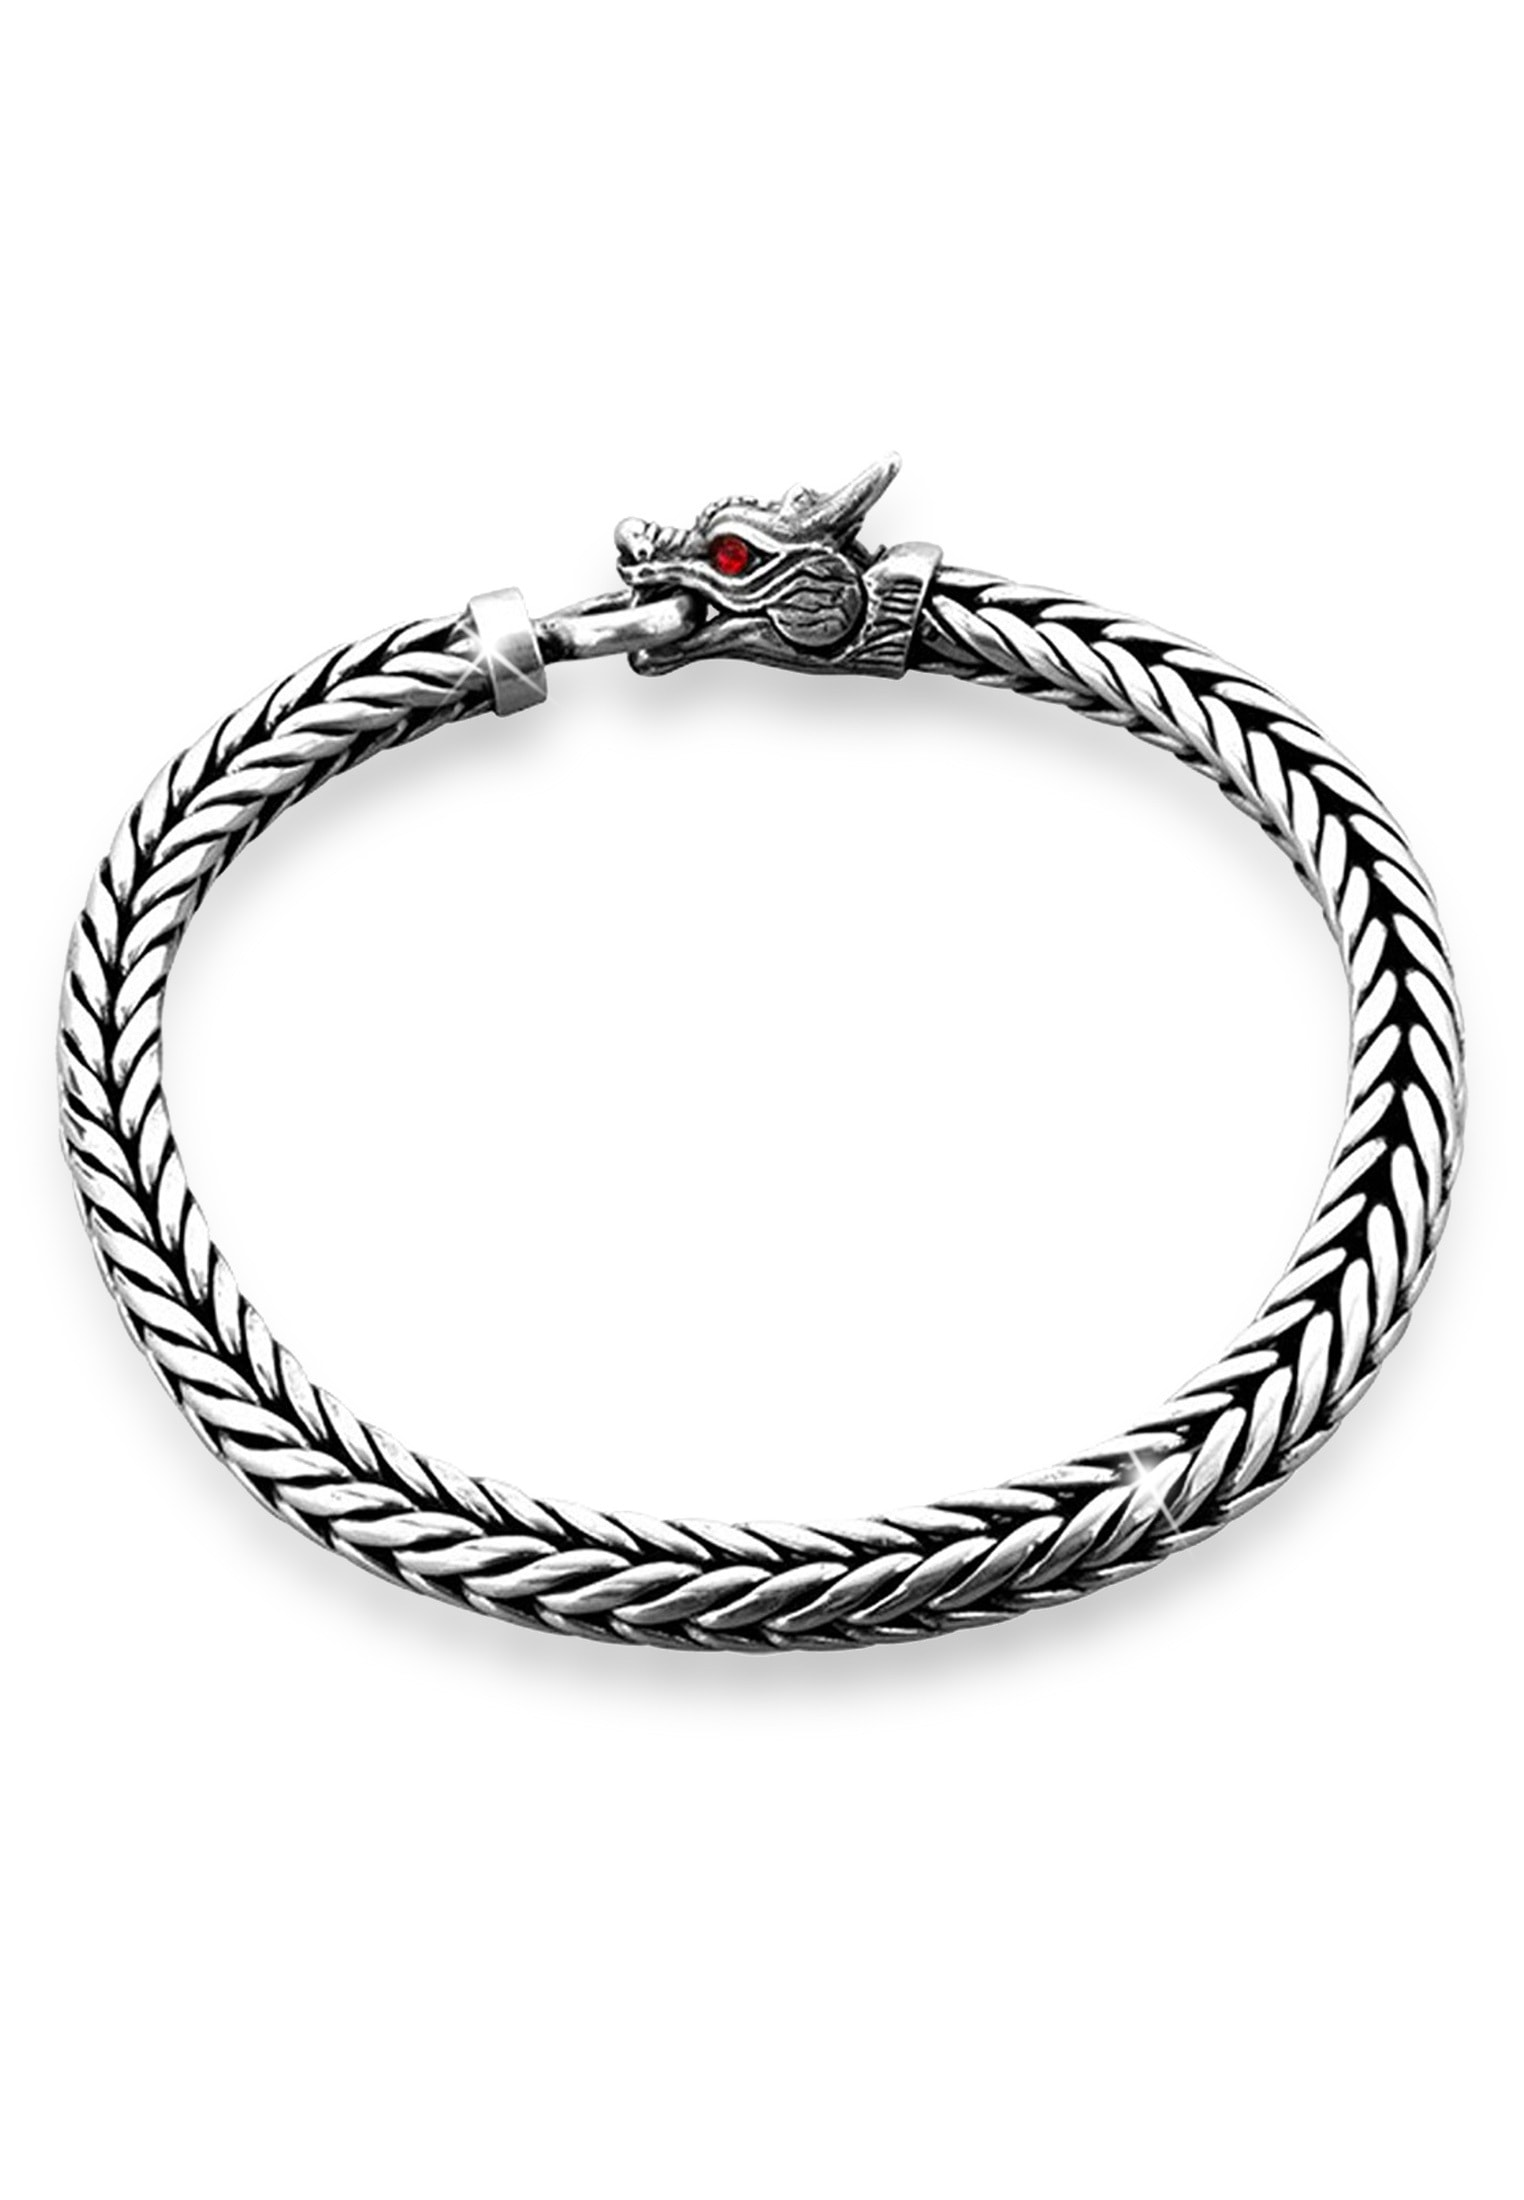 Kuzzoi Armband Herrn Drache Zirkonia Ringverschluss 925er Silber | Schmuck > Armbänder > Silberarmbänder | Kuzzoi